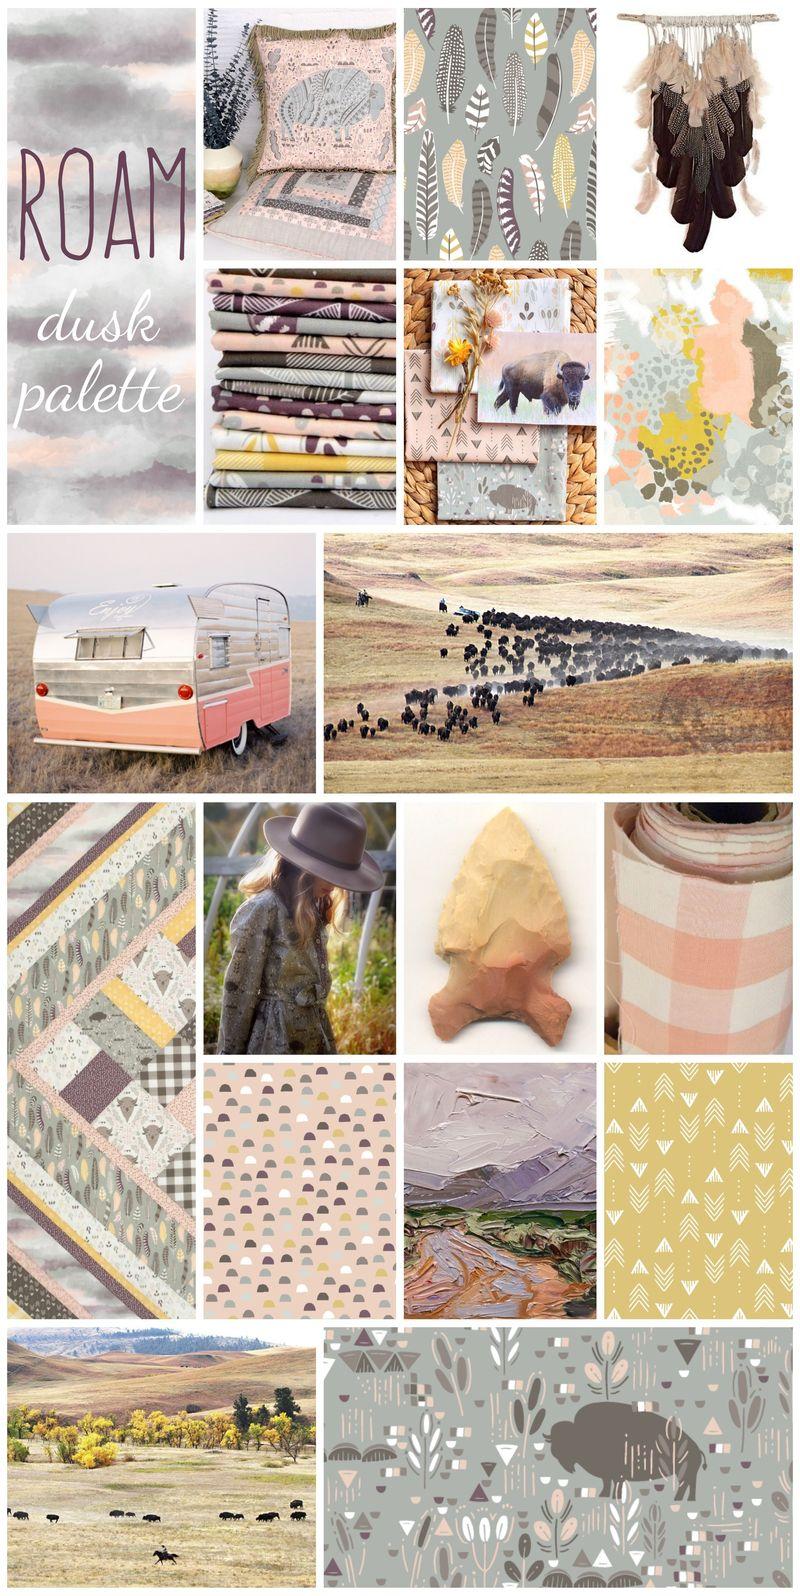 Roam in Dusk Palette Collage Poster Final